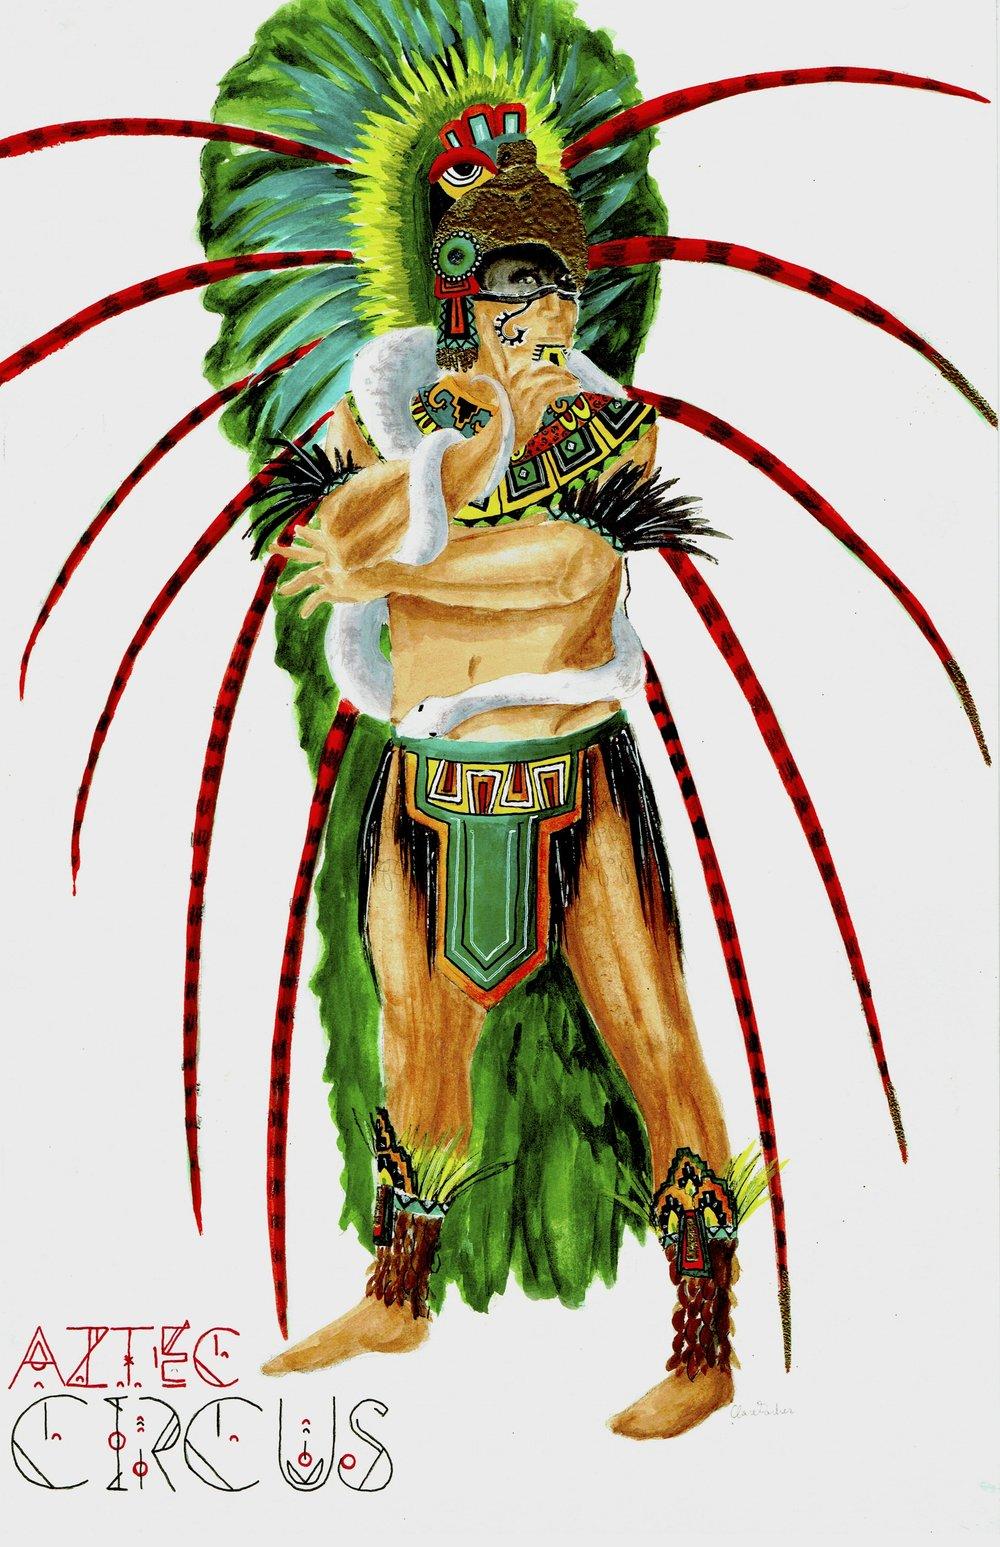 Aztec Circus Ringmaster.jpg